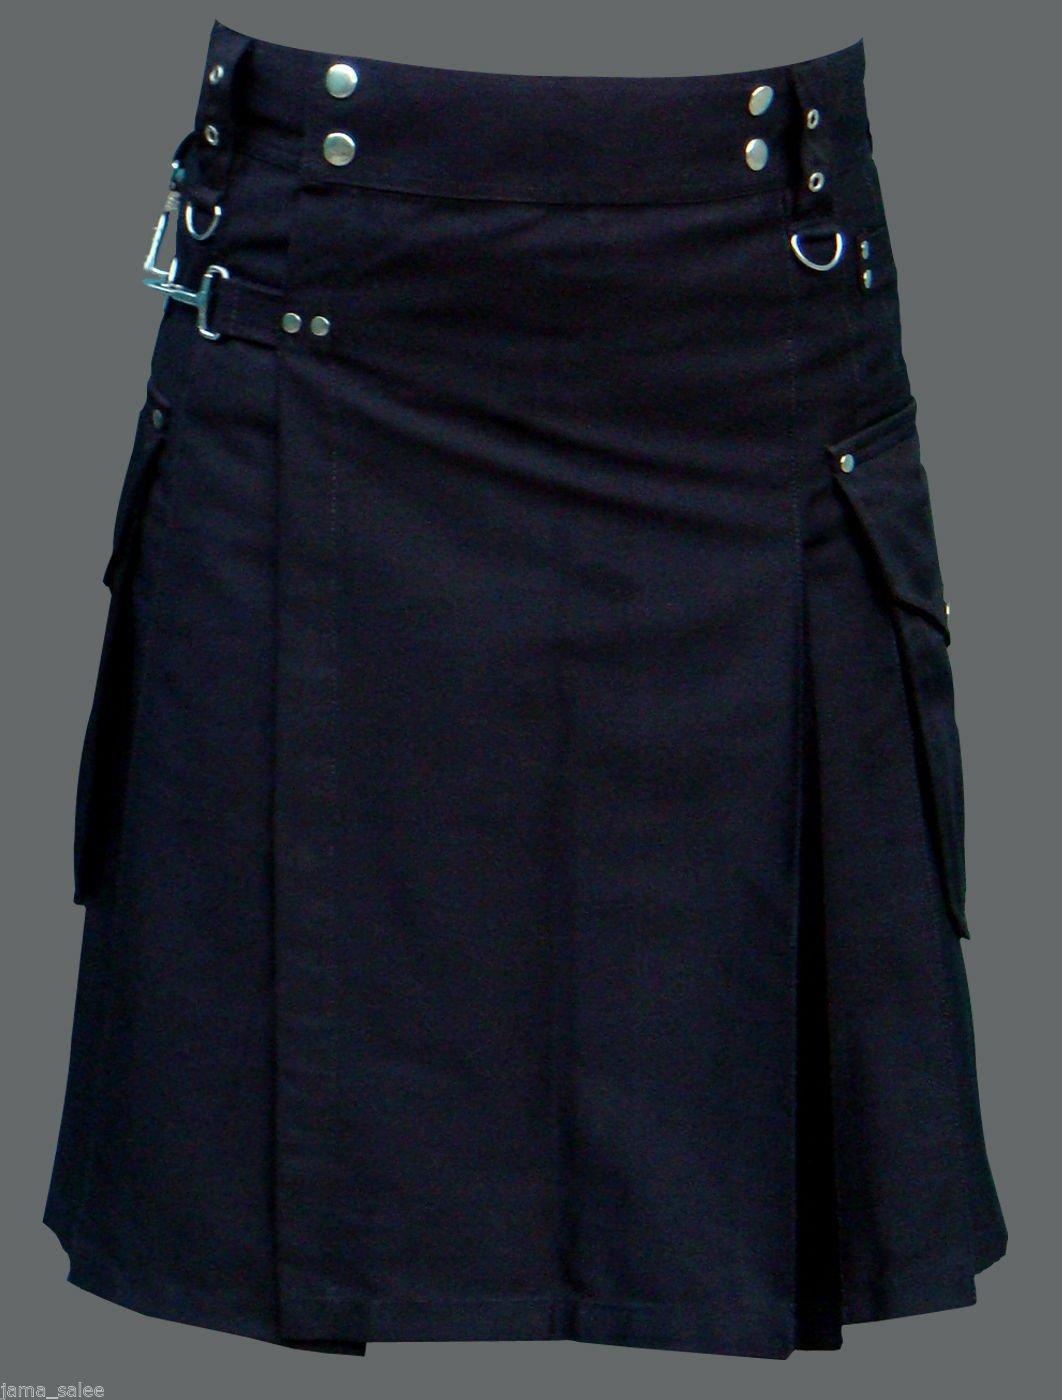 Deluxe Black Cotton Kilt Handmade Utility Gothic Modern Kilt with Cargo Pockets Waist Size 40 to Fit